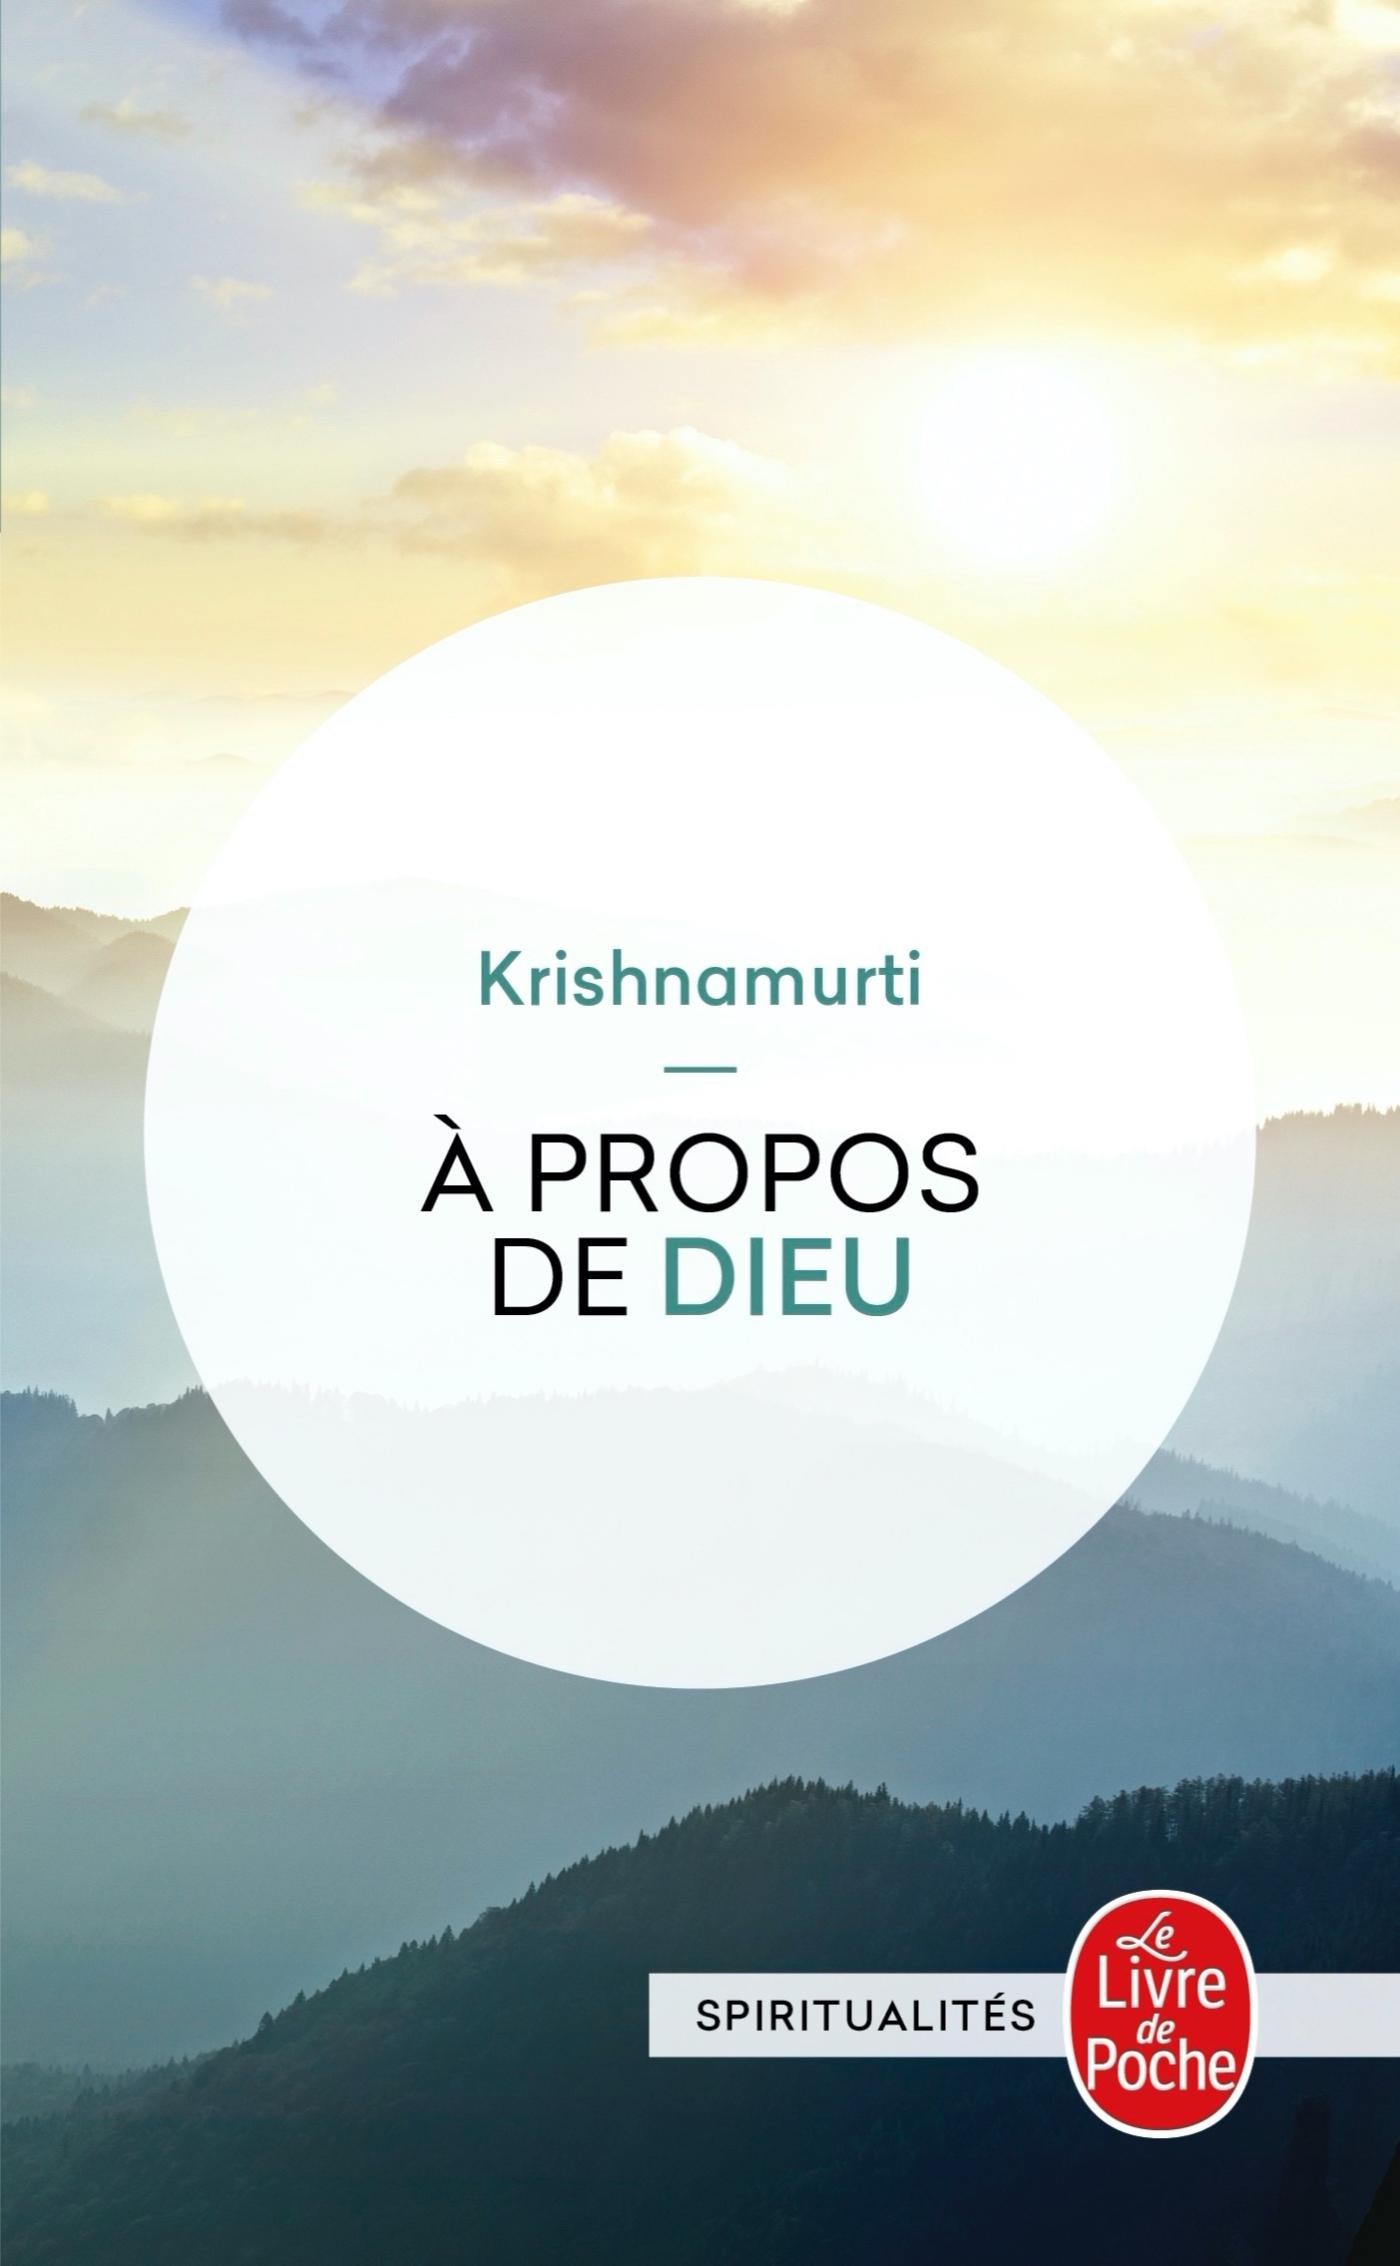 A PROPOS DE DIEU